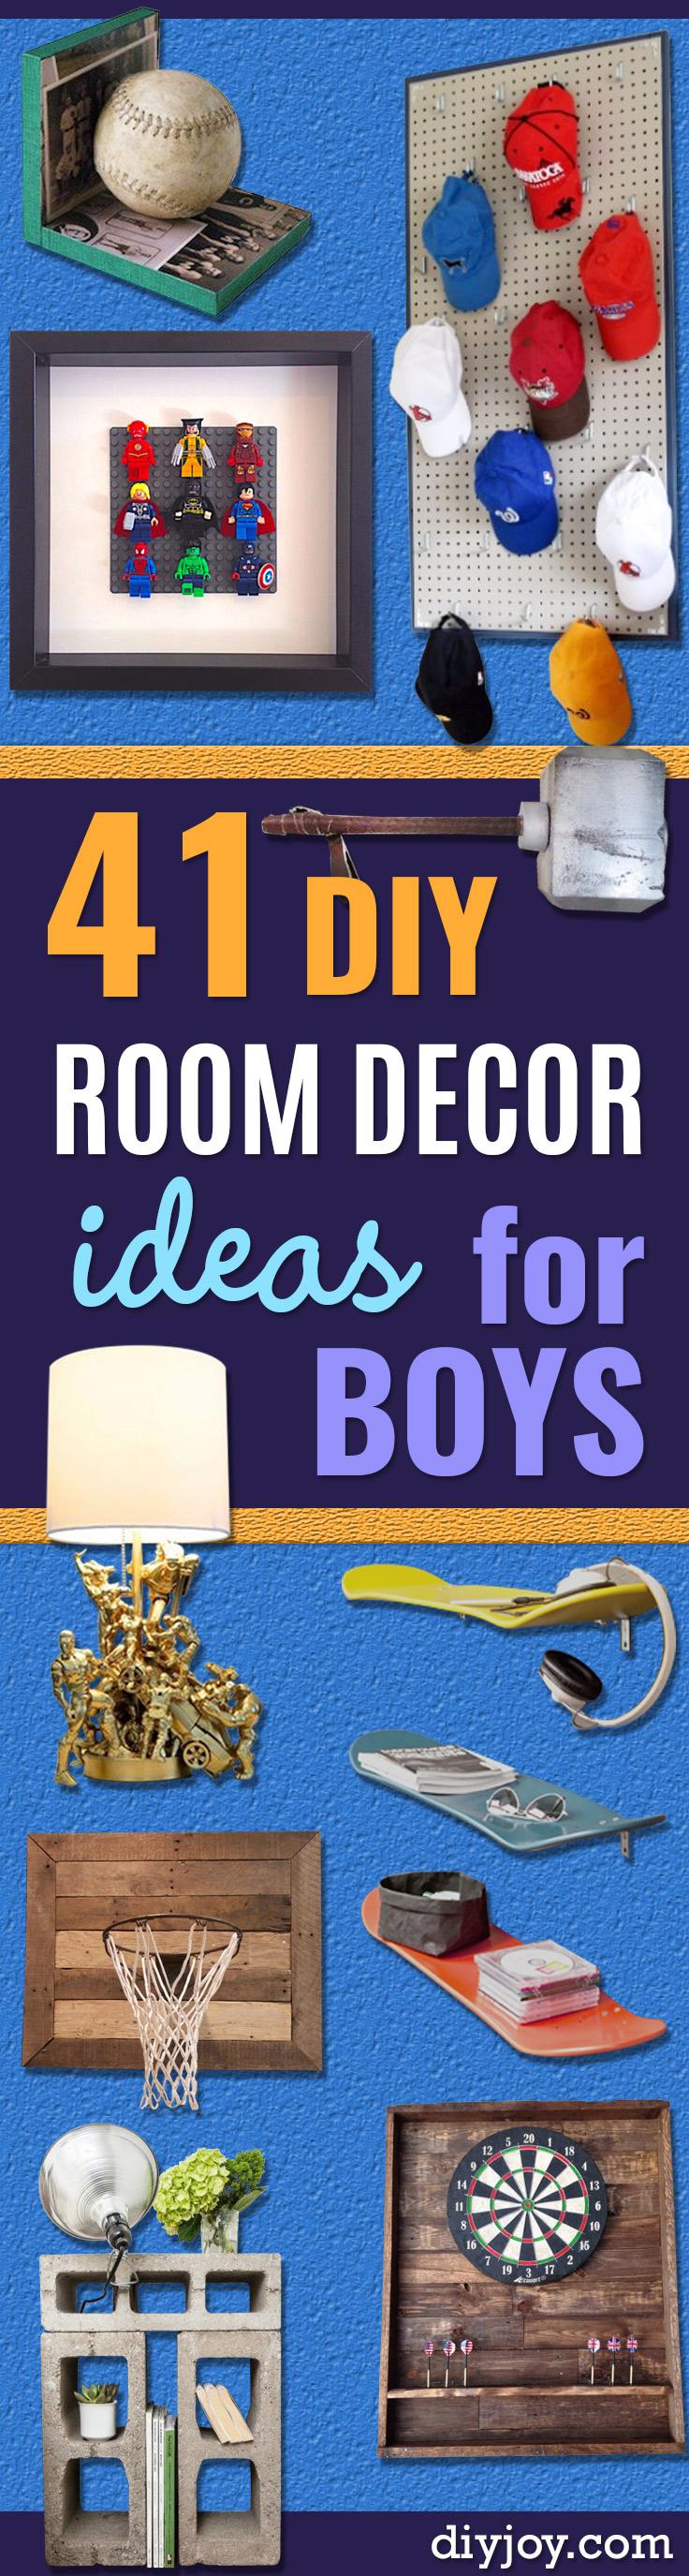 41 super creative diy room decor ideas for boys for Diy room decor zoella